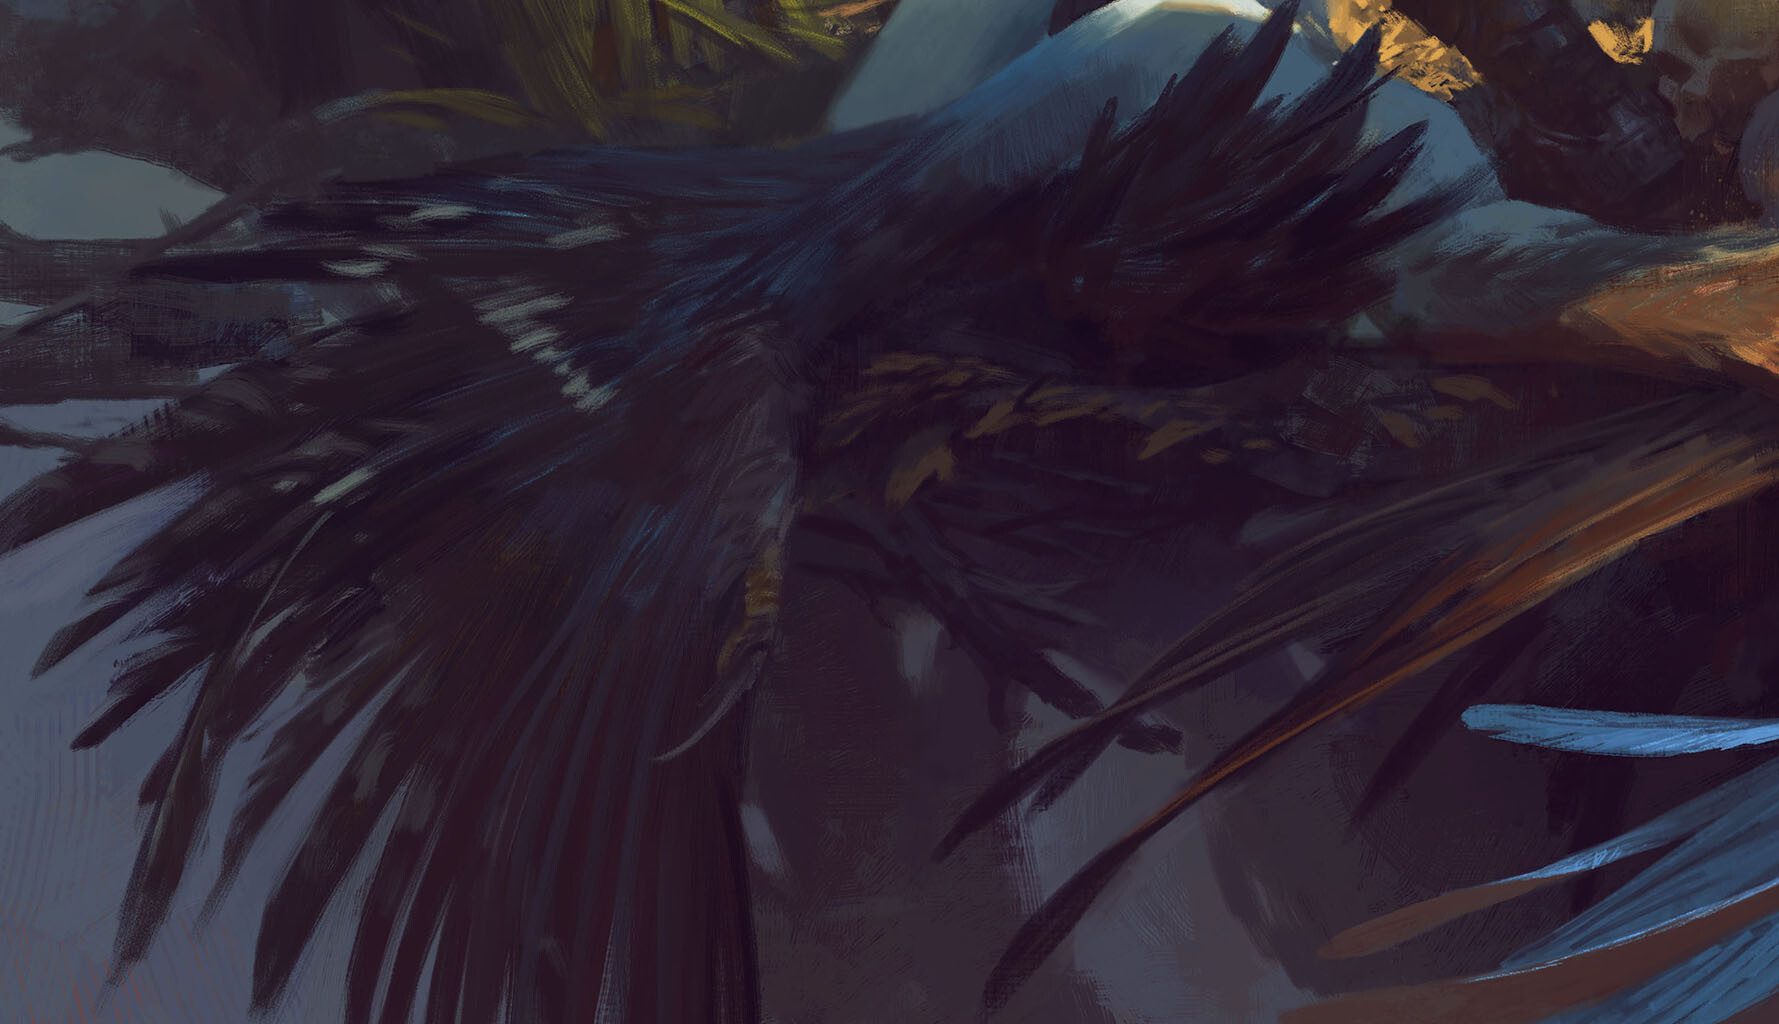 Bayard wu fighting in the harpy nest p06